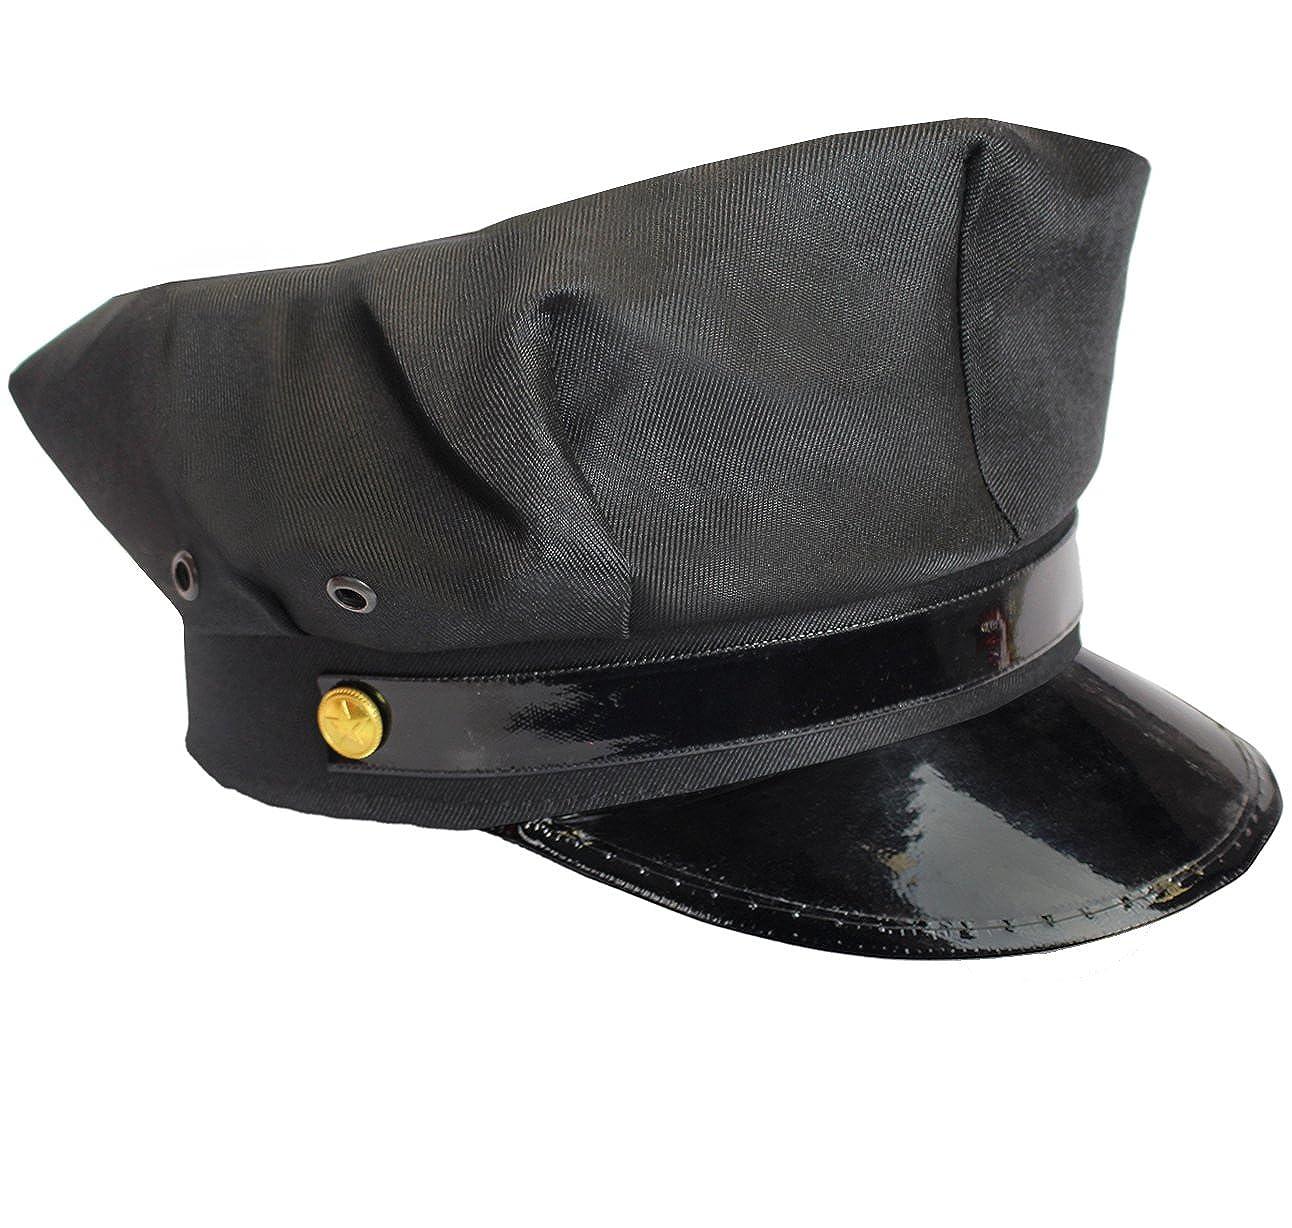 Amazon.com  Black Chauffeur Taxi Limo Driver Hat Cap  Clothing a2ce2d2fc43